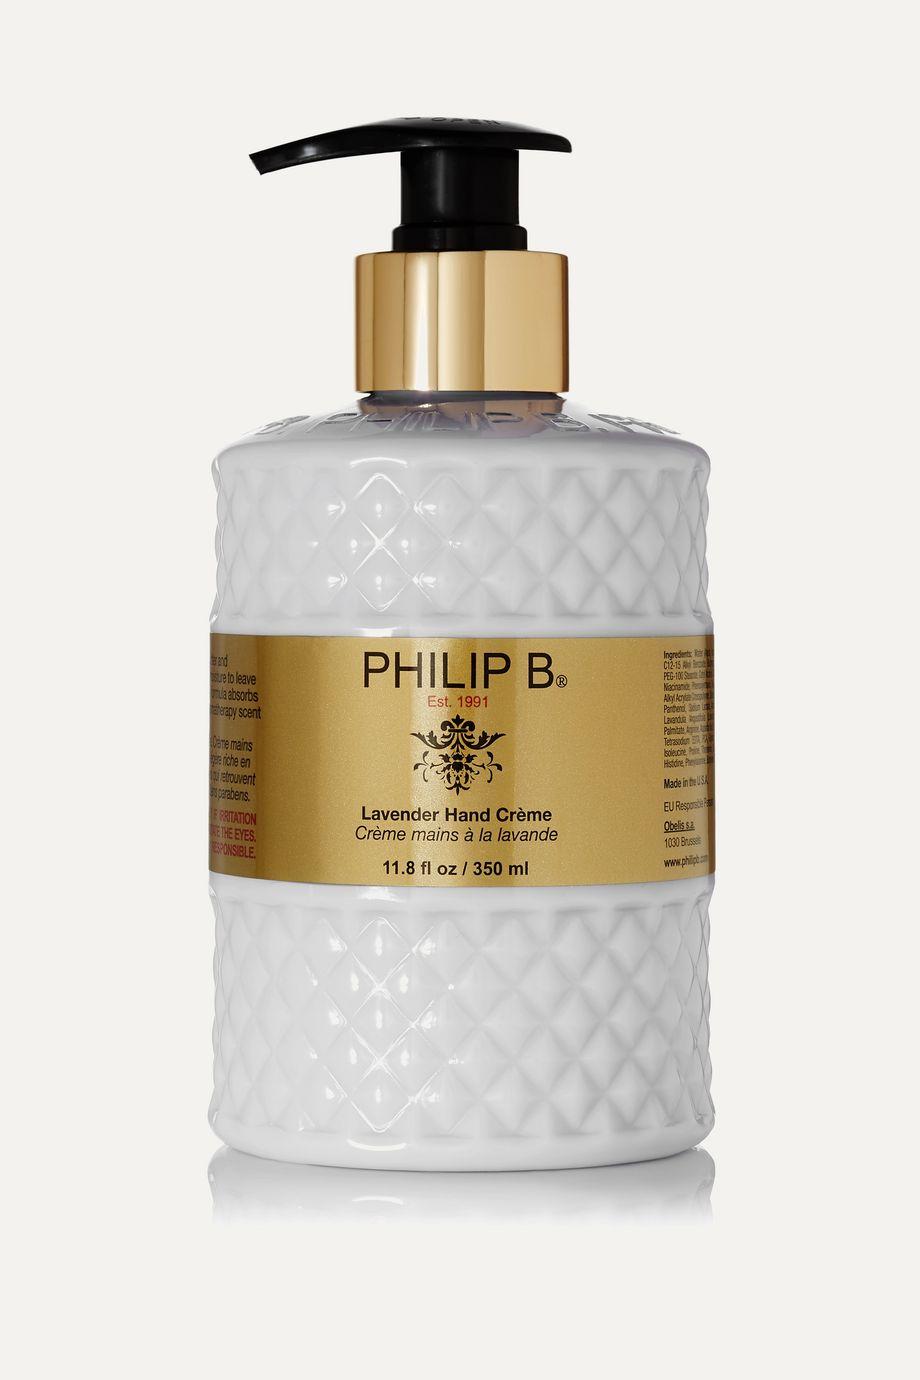 Philip B Lavender Hand Crème, 350ml